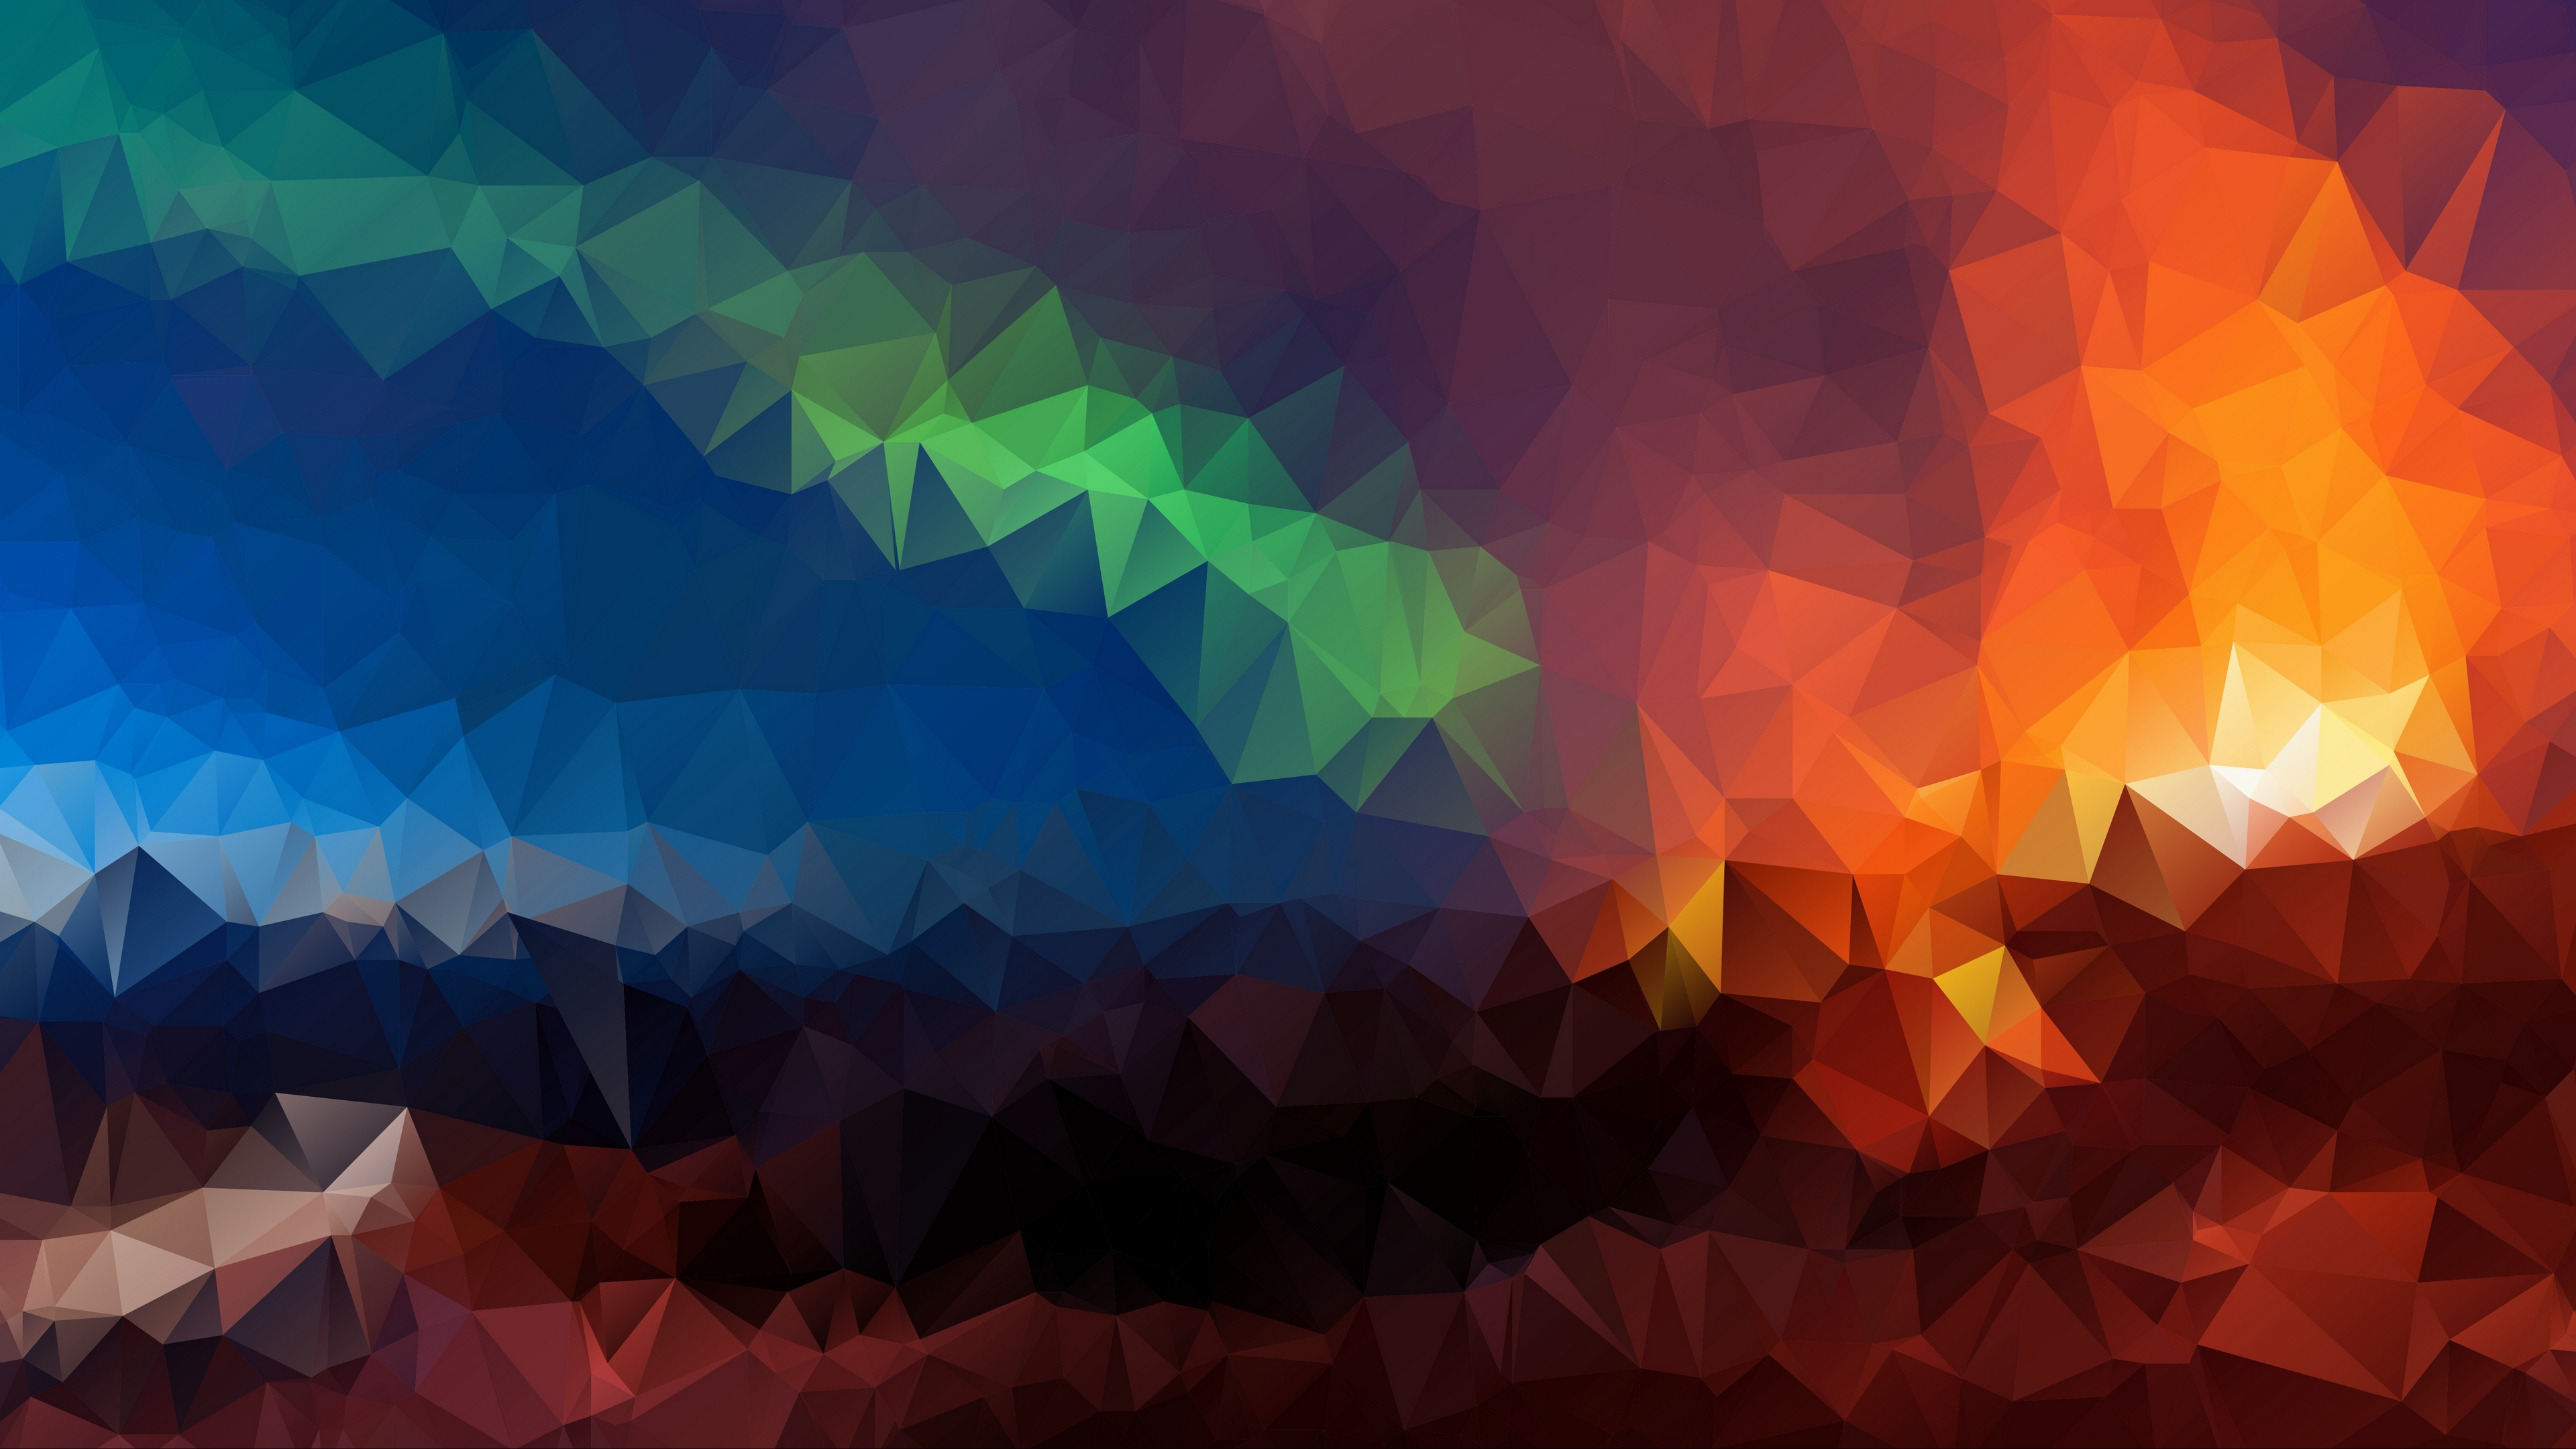 triangles geometric mosaic multicolored 4k 1536097800 - triangles, geometric, mosaic, multicolored 4k - Triangles, Mosaic, Geometric